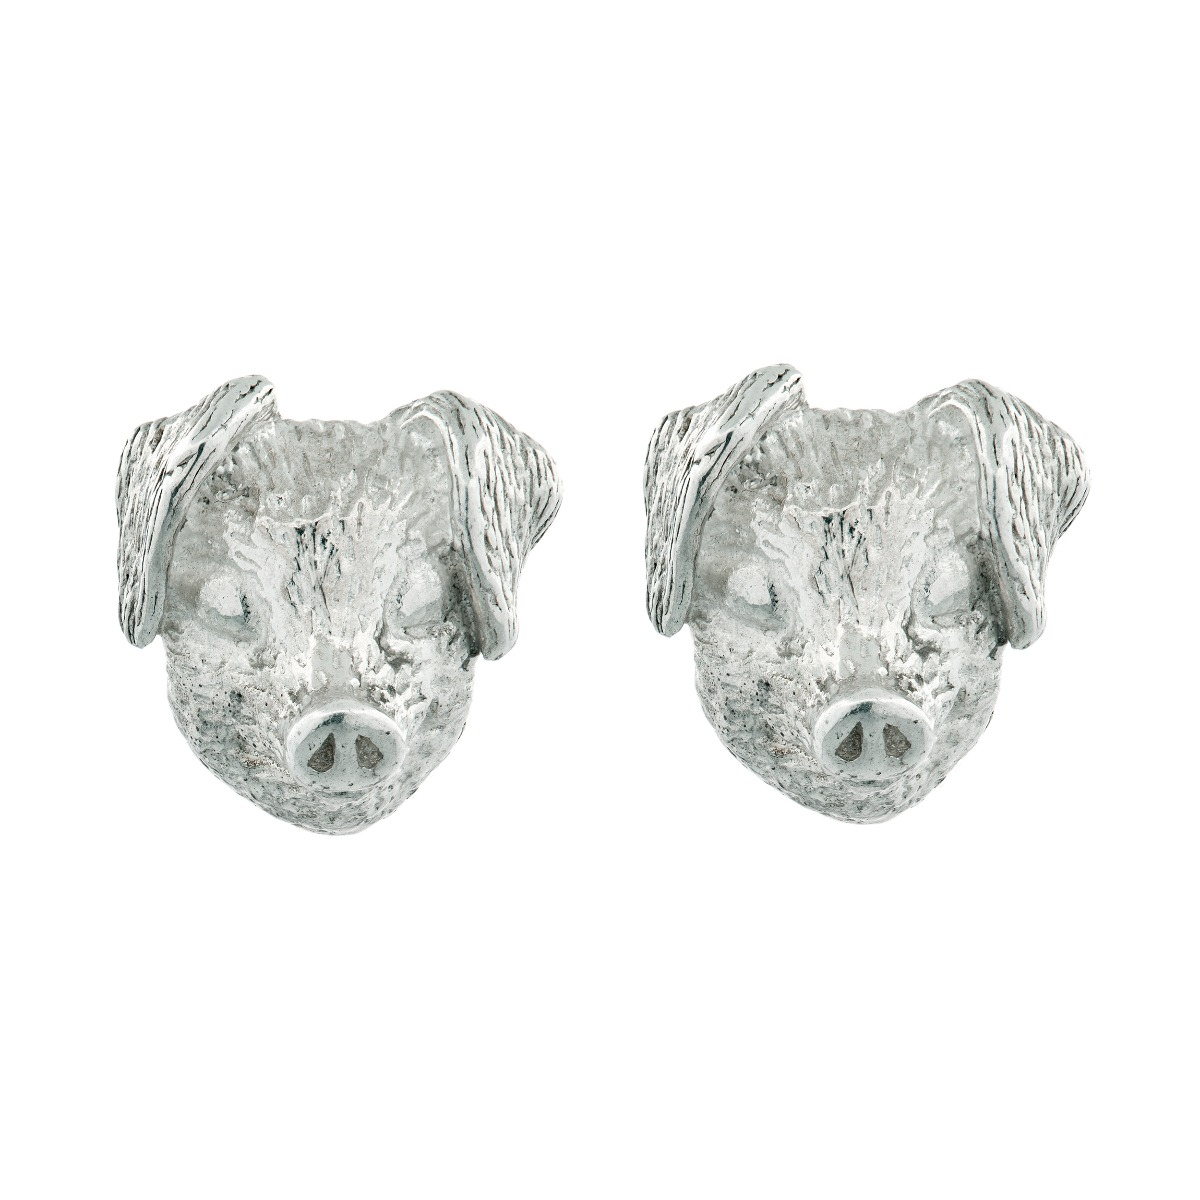 Chinese zodiac stud earrings (pig)